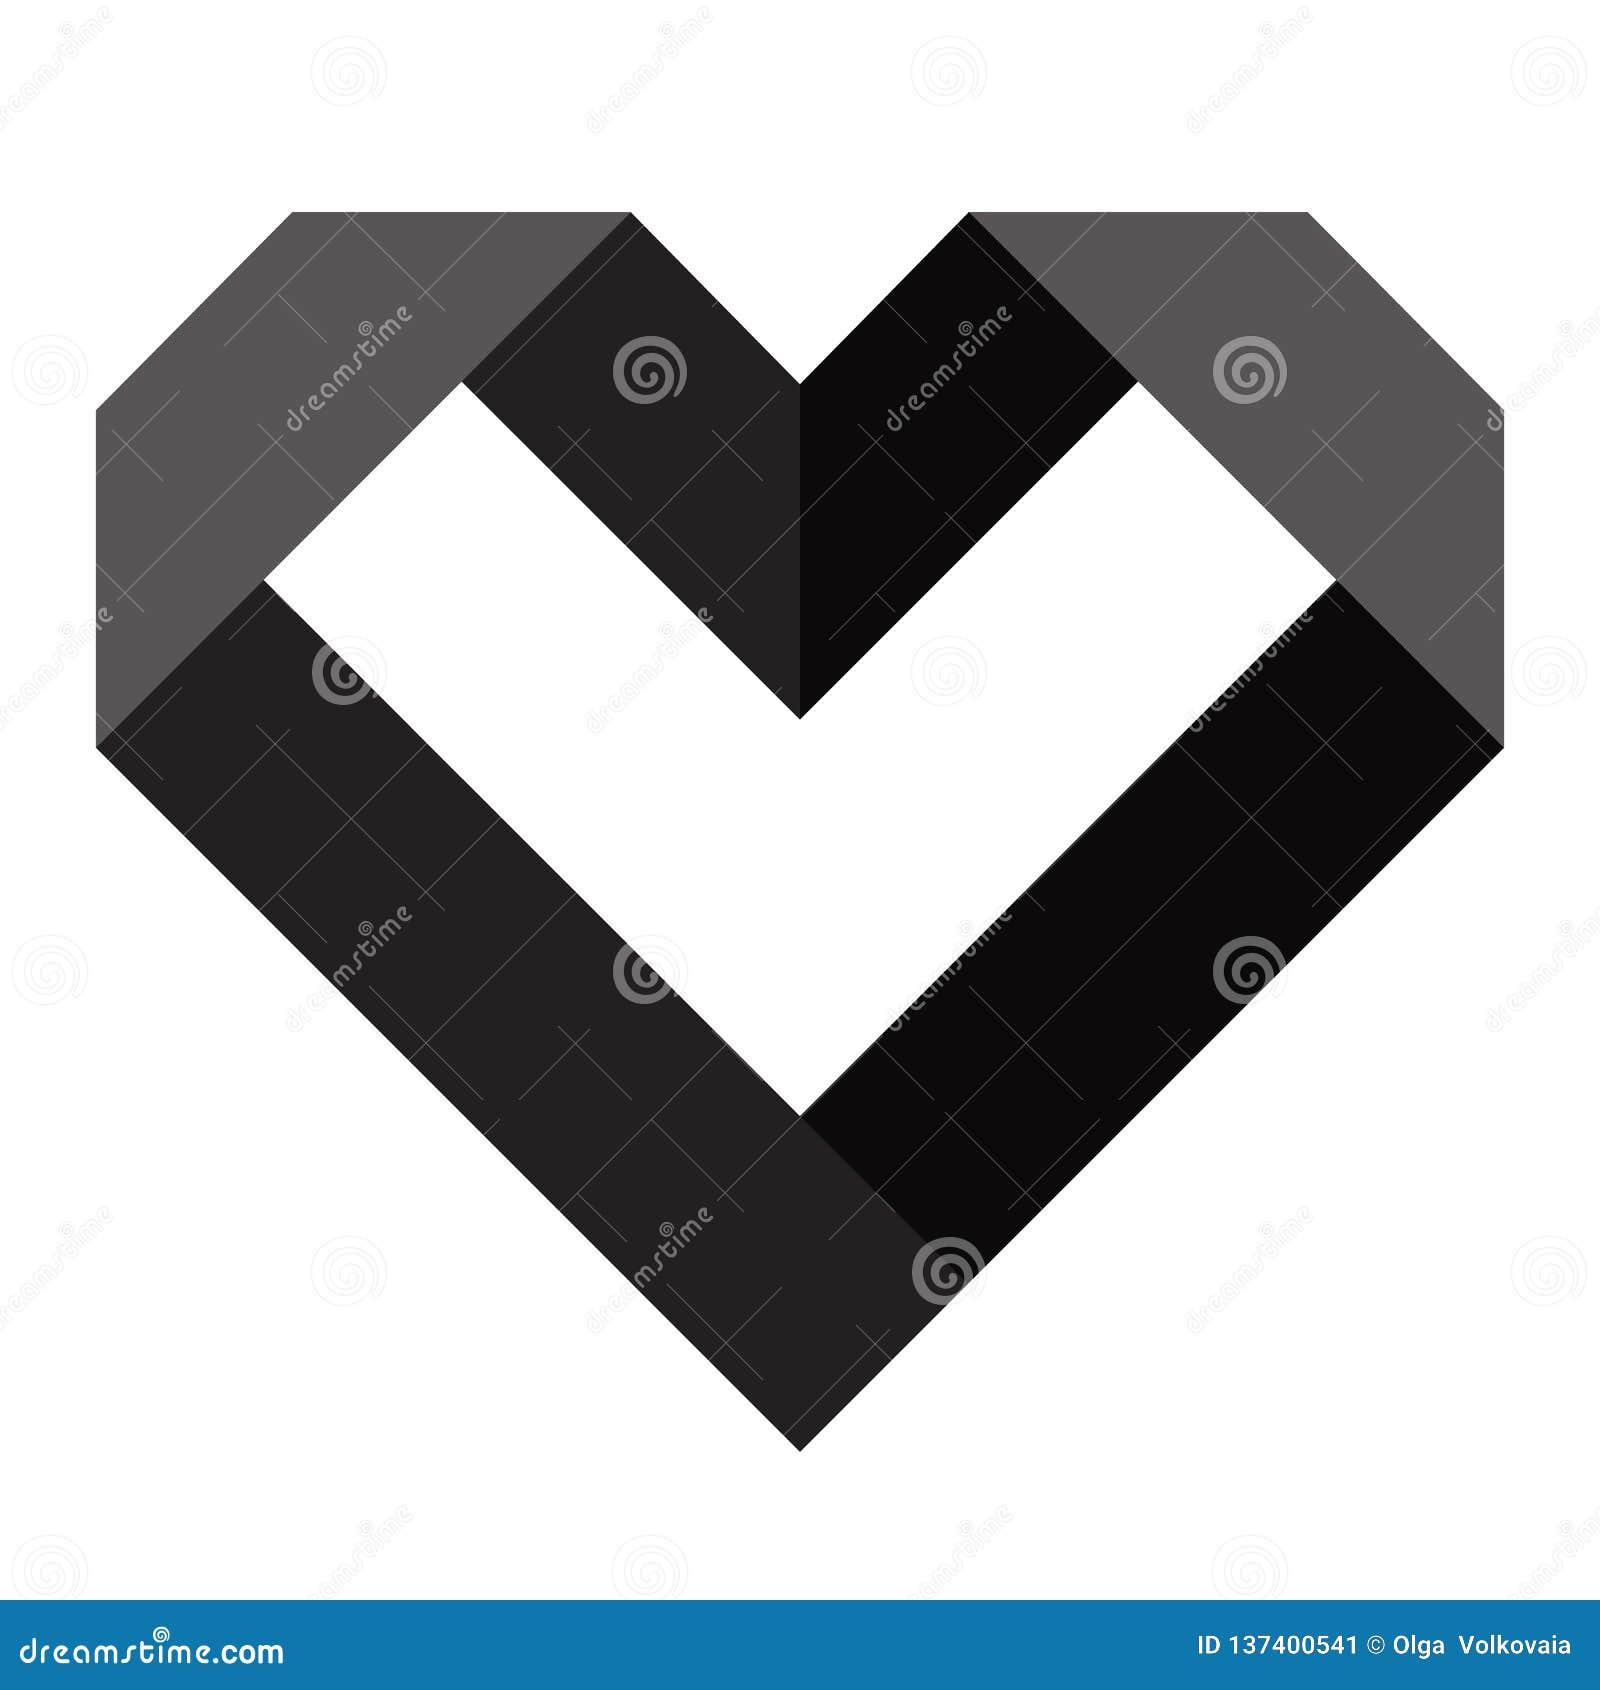 Black heart icon, love icon